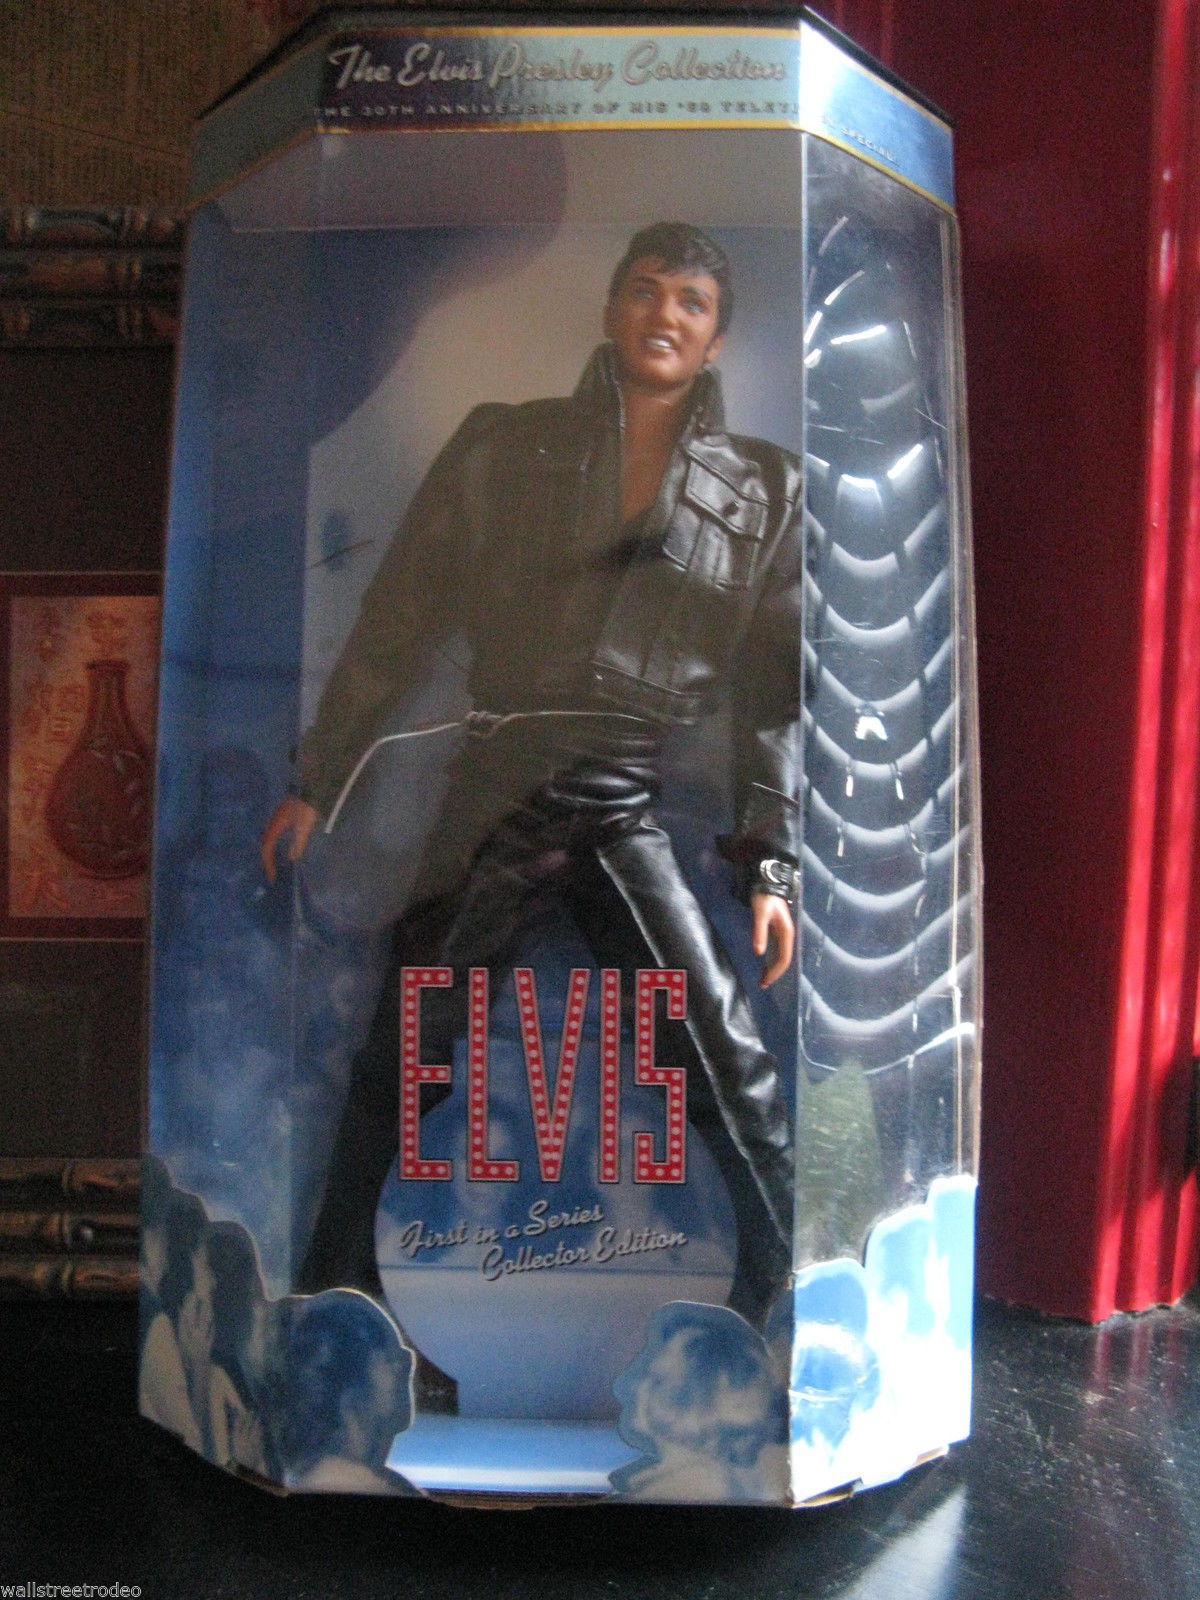 1998 Mattel Elvis Presley doll Comeback Special 1st  in Collection rockabilly image 2